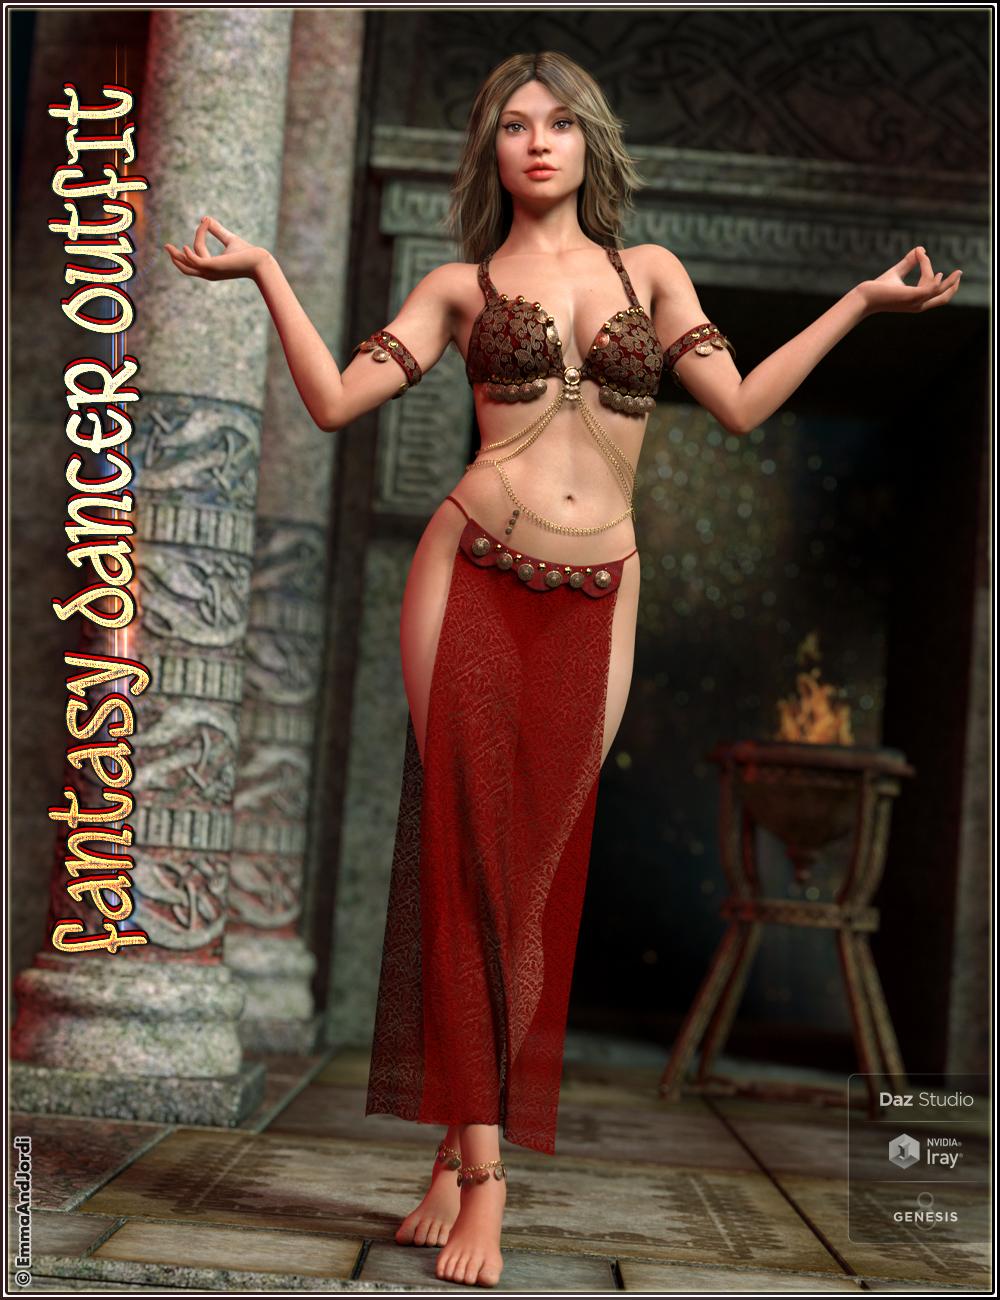 dForce Fantasy Dancer Outfit and Poses For Genesis 8 Female(s) by: EmmaAndJordi, 3D Models by Daz 3D